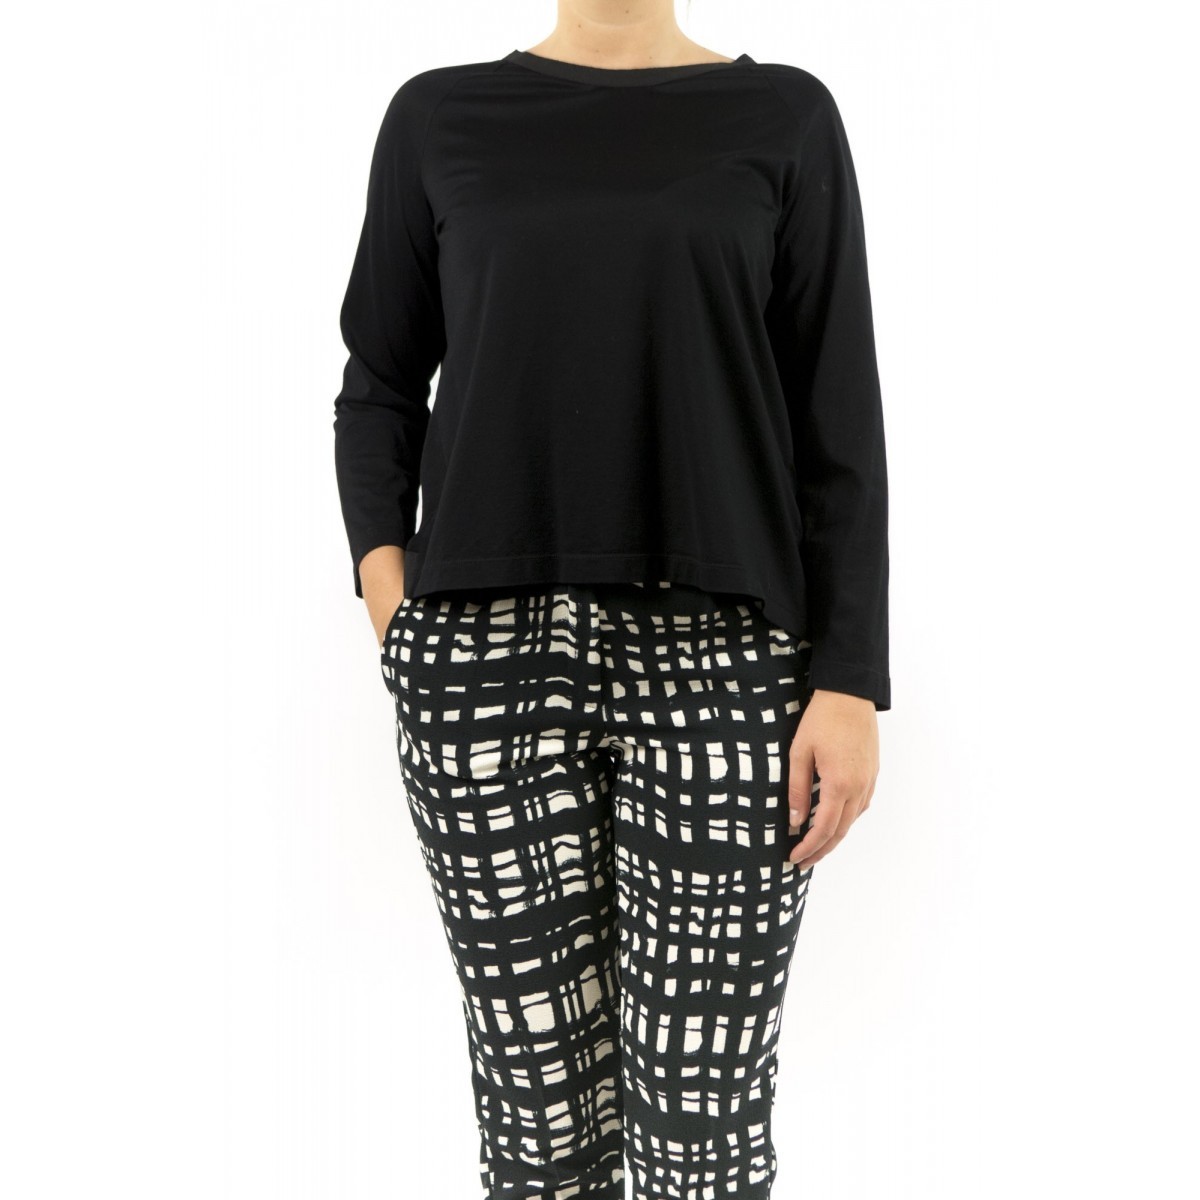 T-shirt donna Erika cavallini - semicouture - P5i128 t-shirt filo scozia 009 - nero